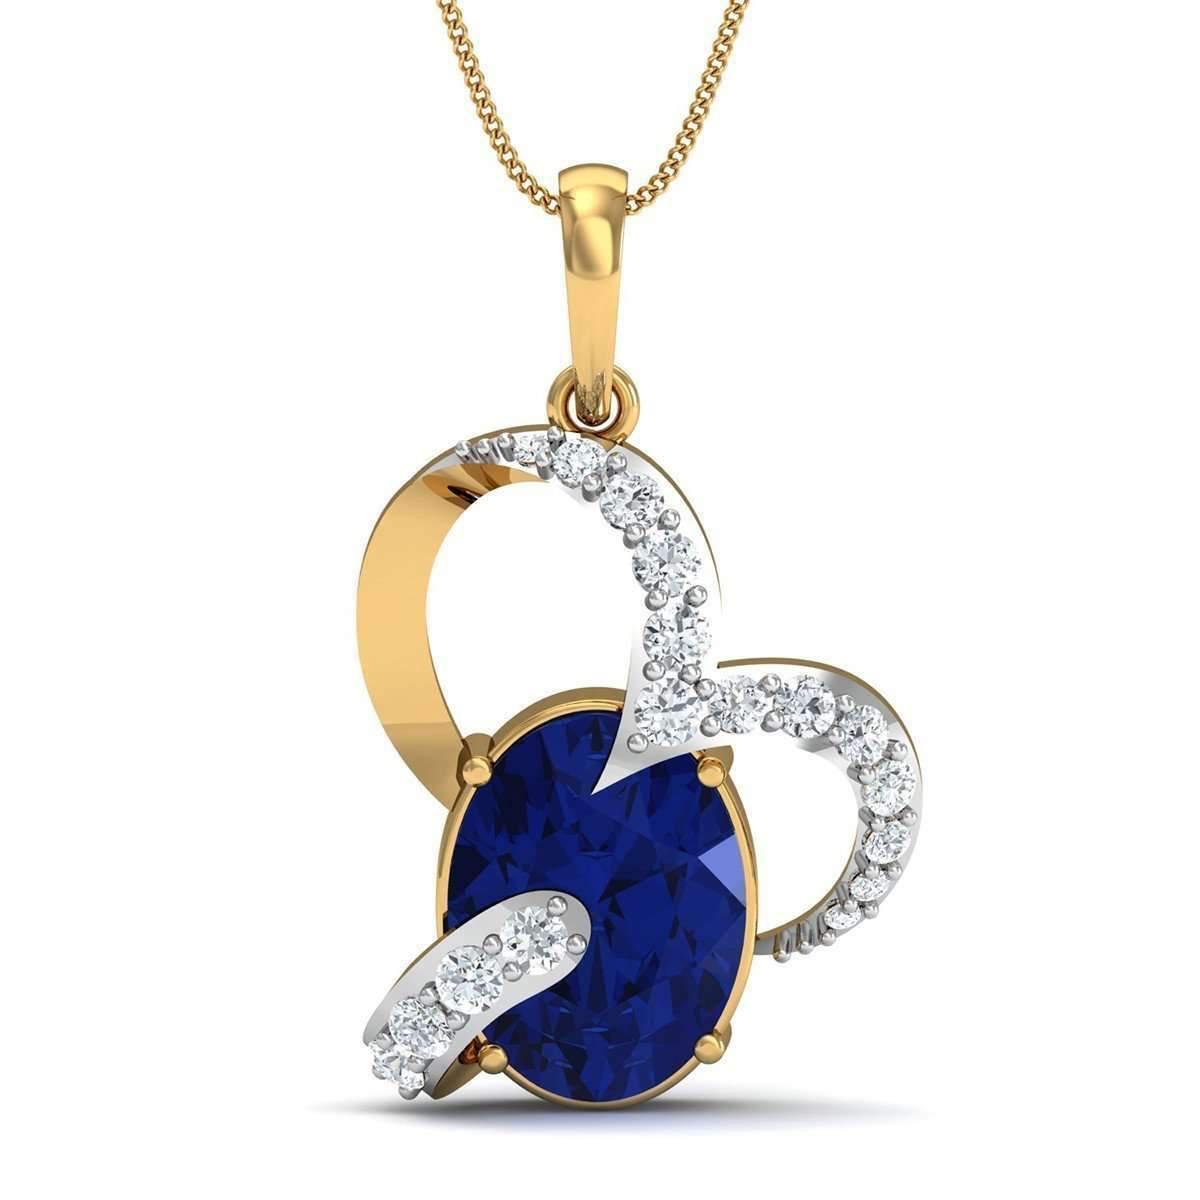 Diamoire Jewels Blue Pear Cut Sapphire and Diamond Pendant in 14kt Yellow Gold bXRNa6KtSF